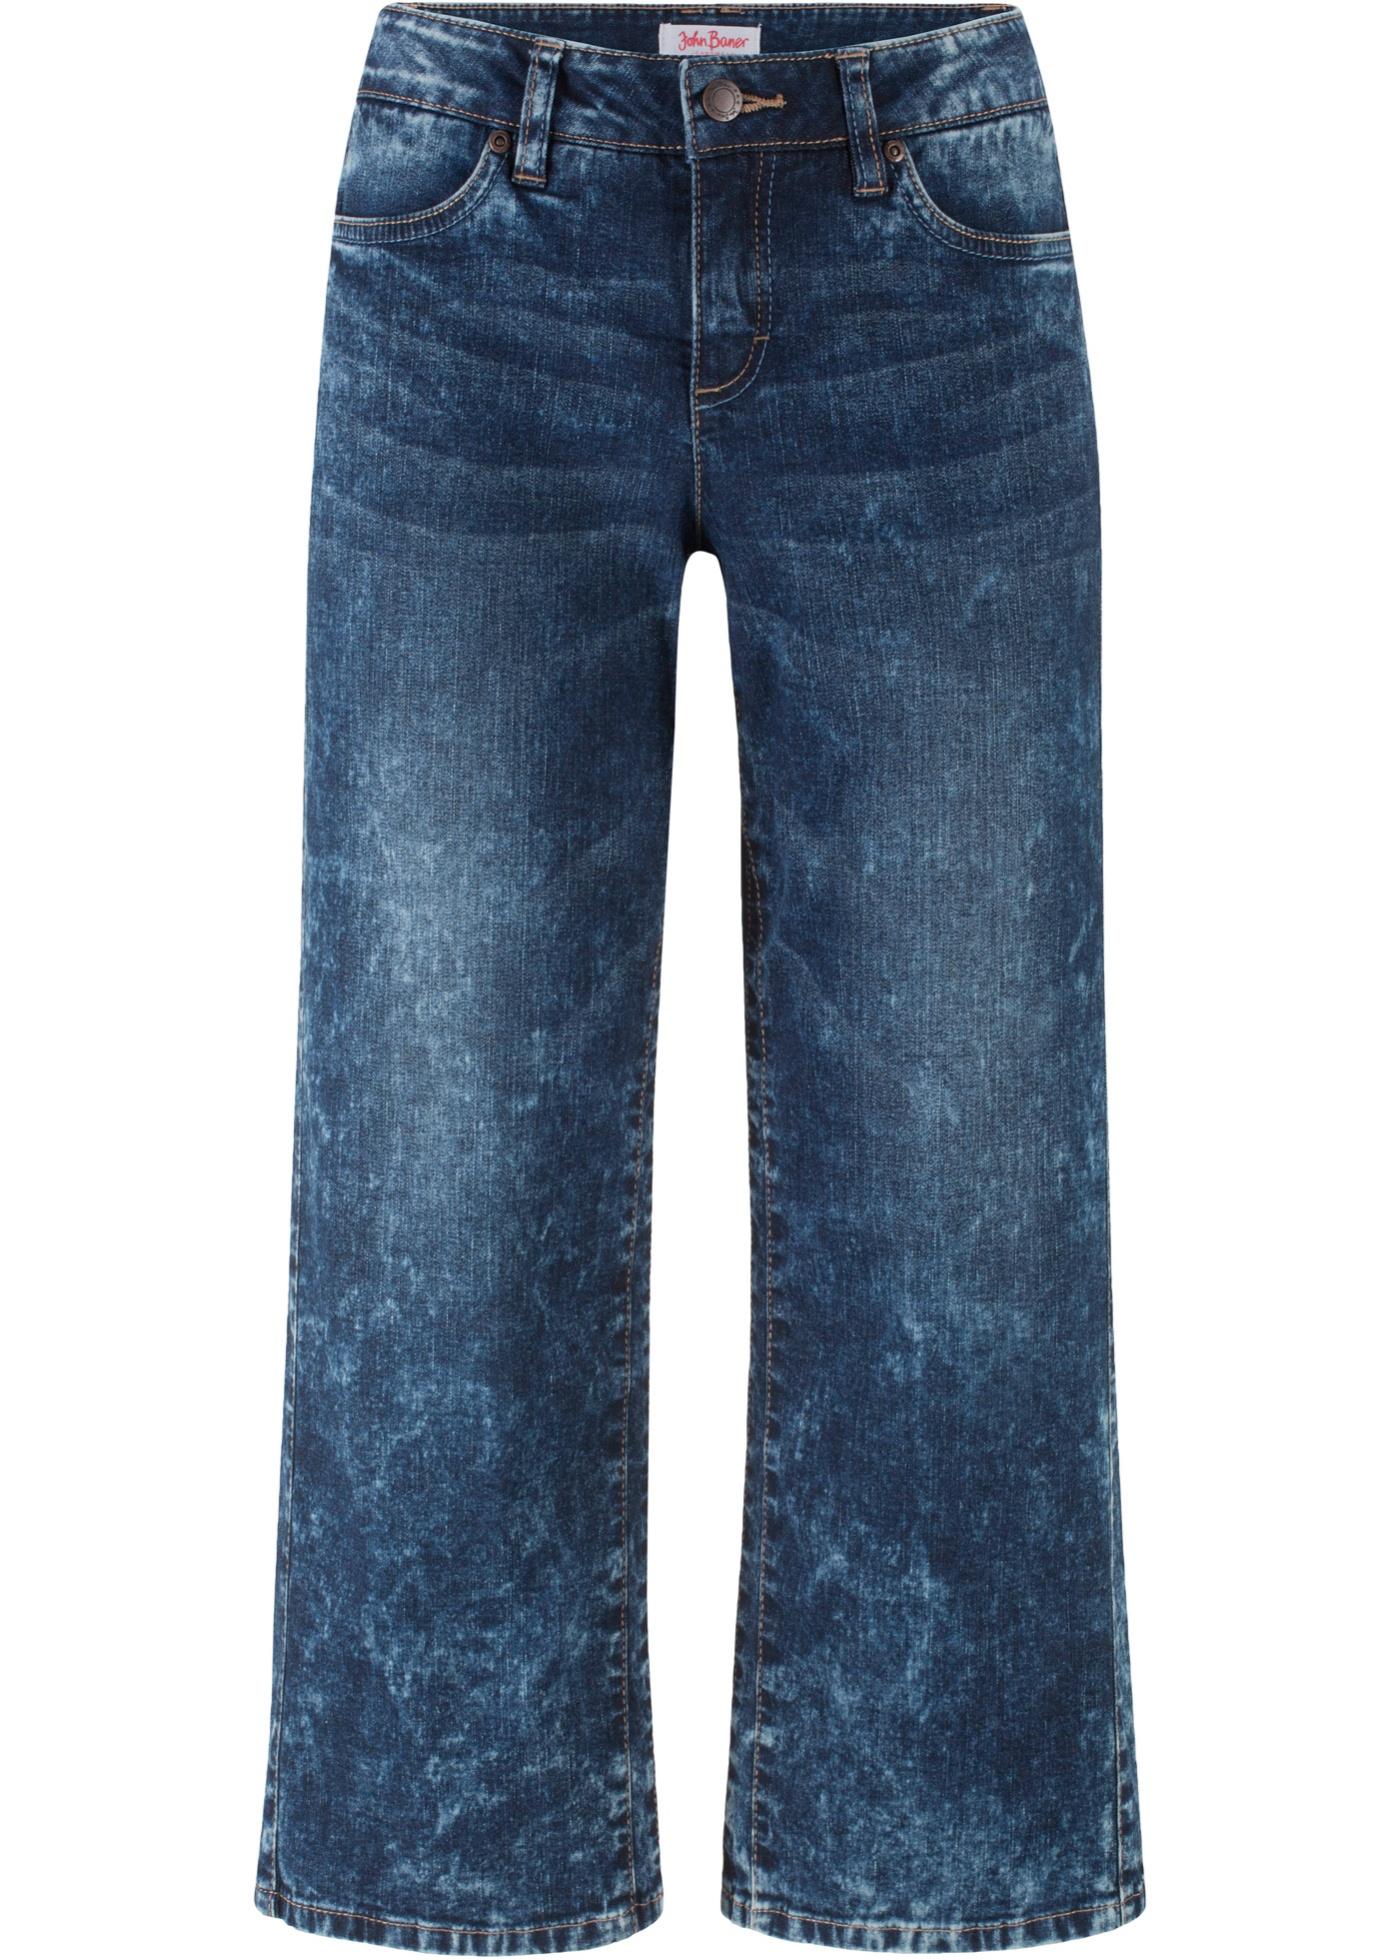 Bonprix - Jeans 159.00